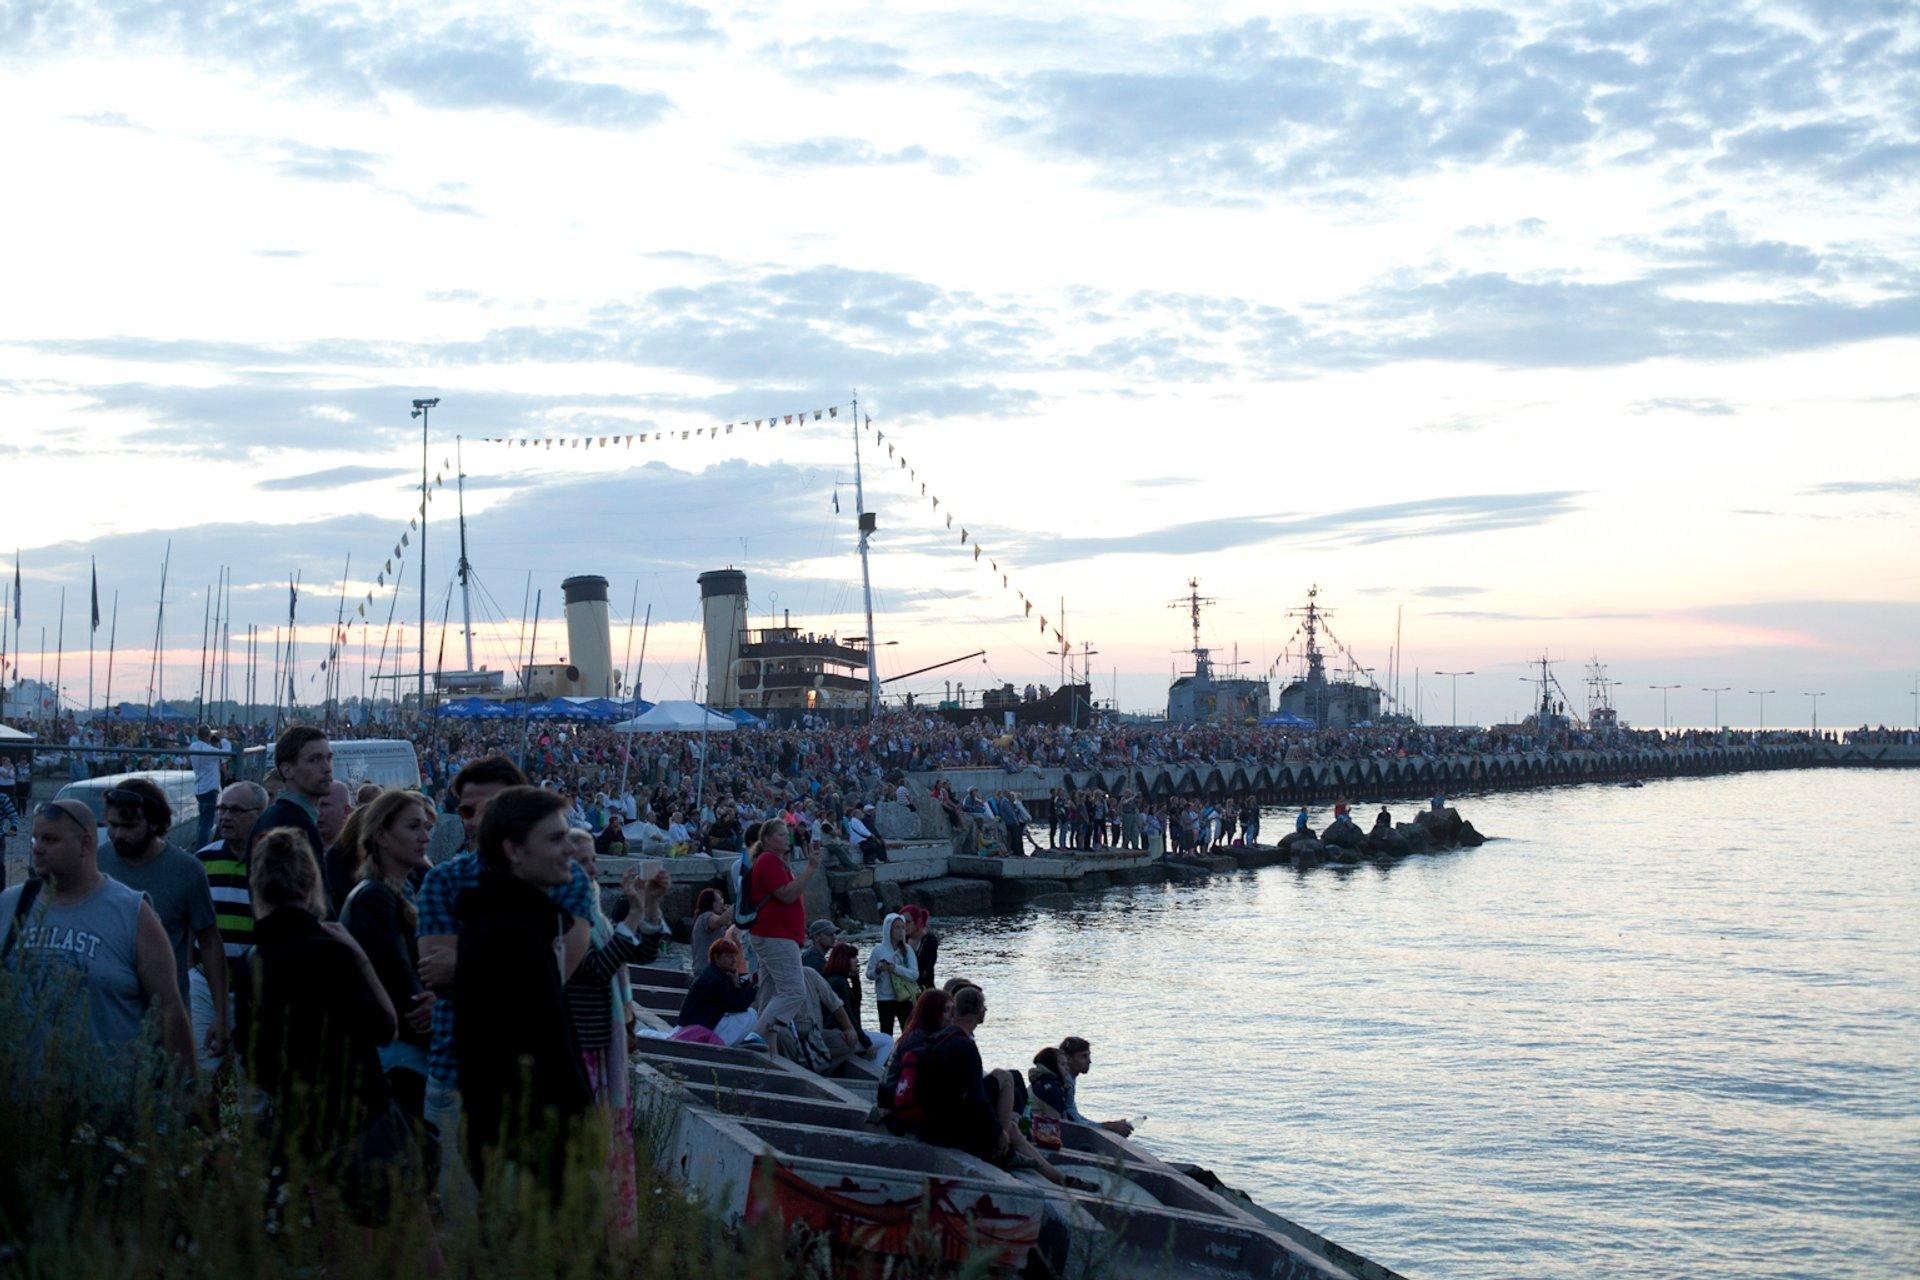 Best time to see Tallinn Maritime Days in Estonia 2020